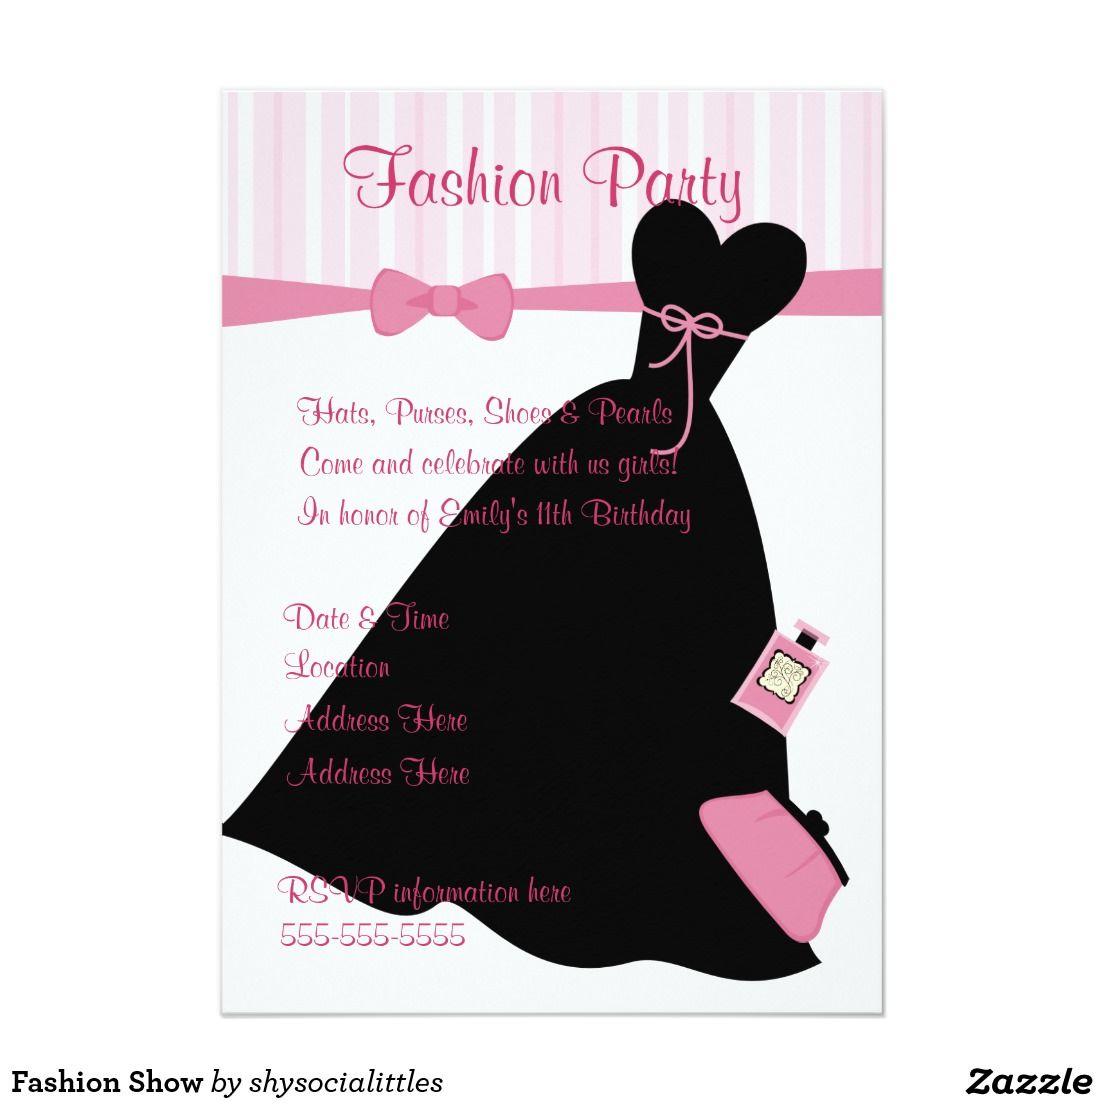 Fashion Show Invitation Template Elegant Fashion Show Invitations Example Invitation Template Fashion Show Invitation Invitation Examples